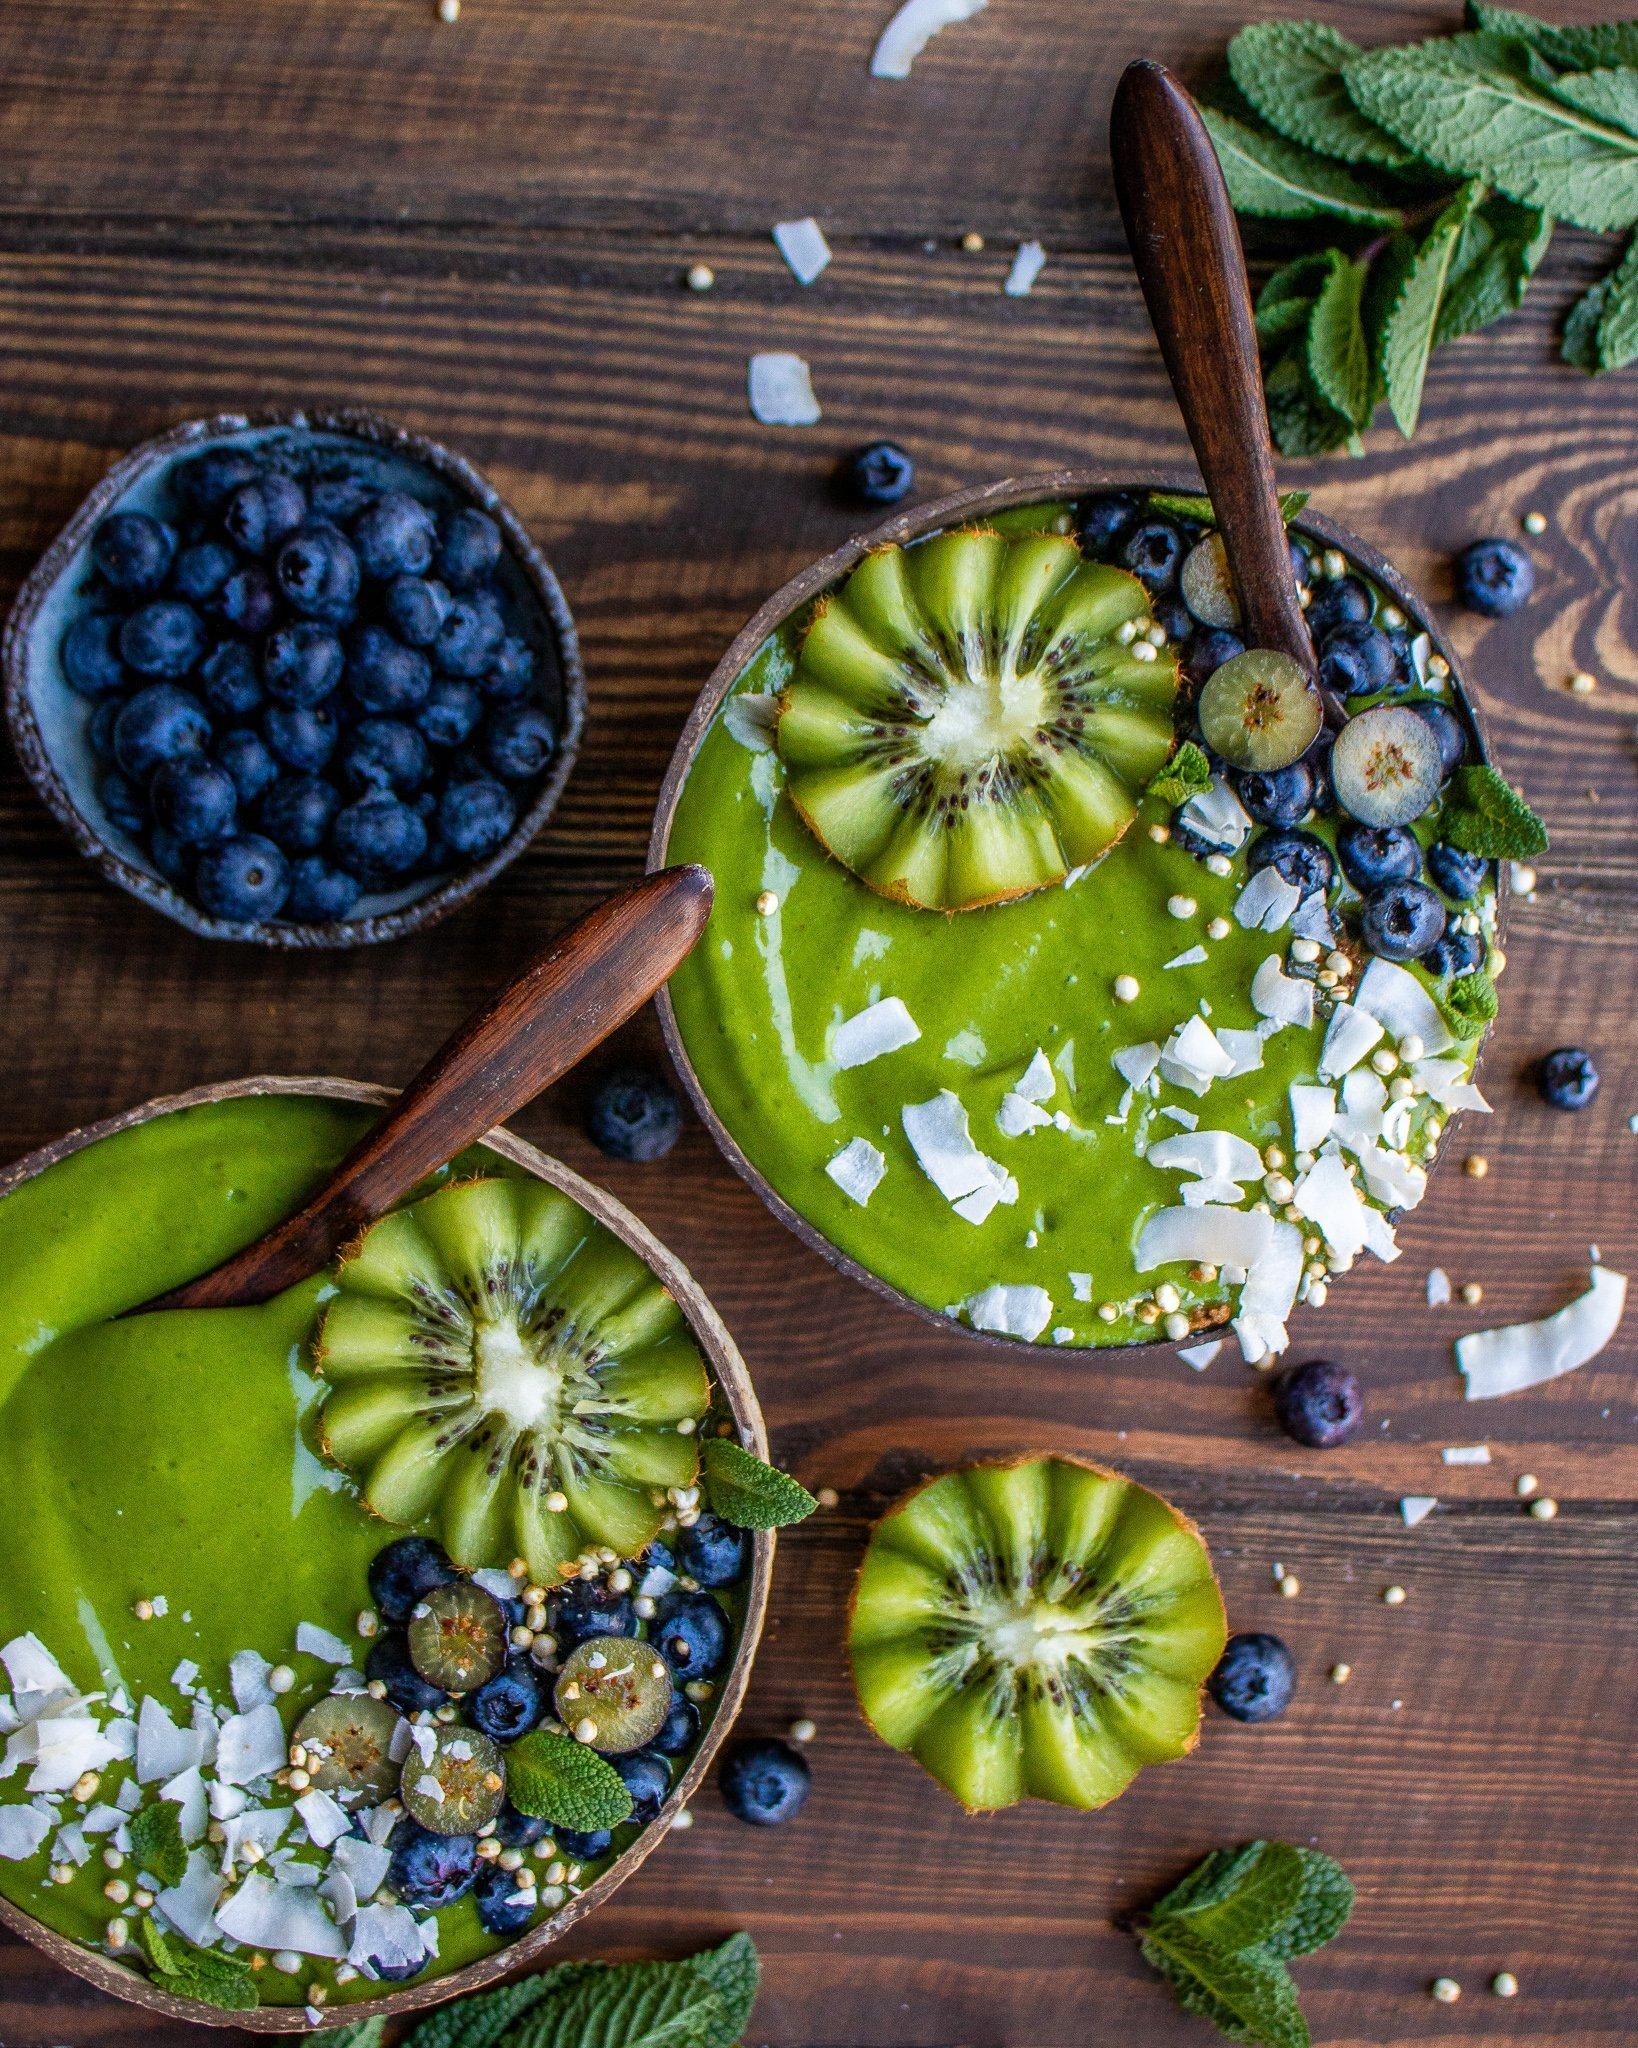 Green Beauty & Green Goddess Smoothie Bowl